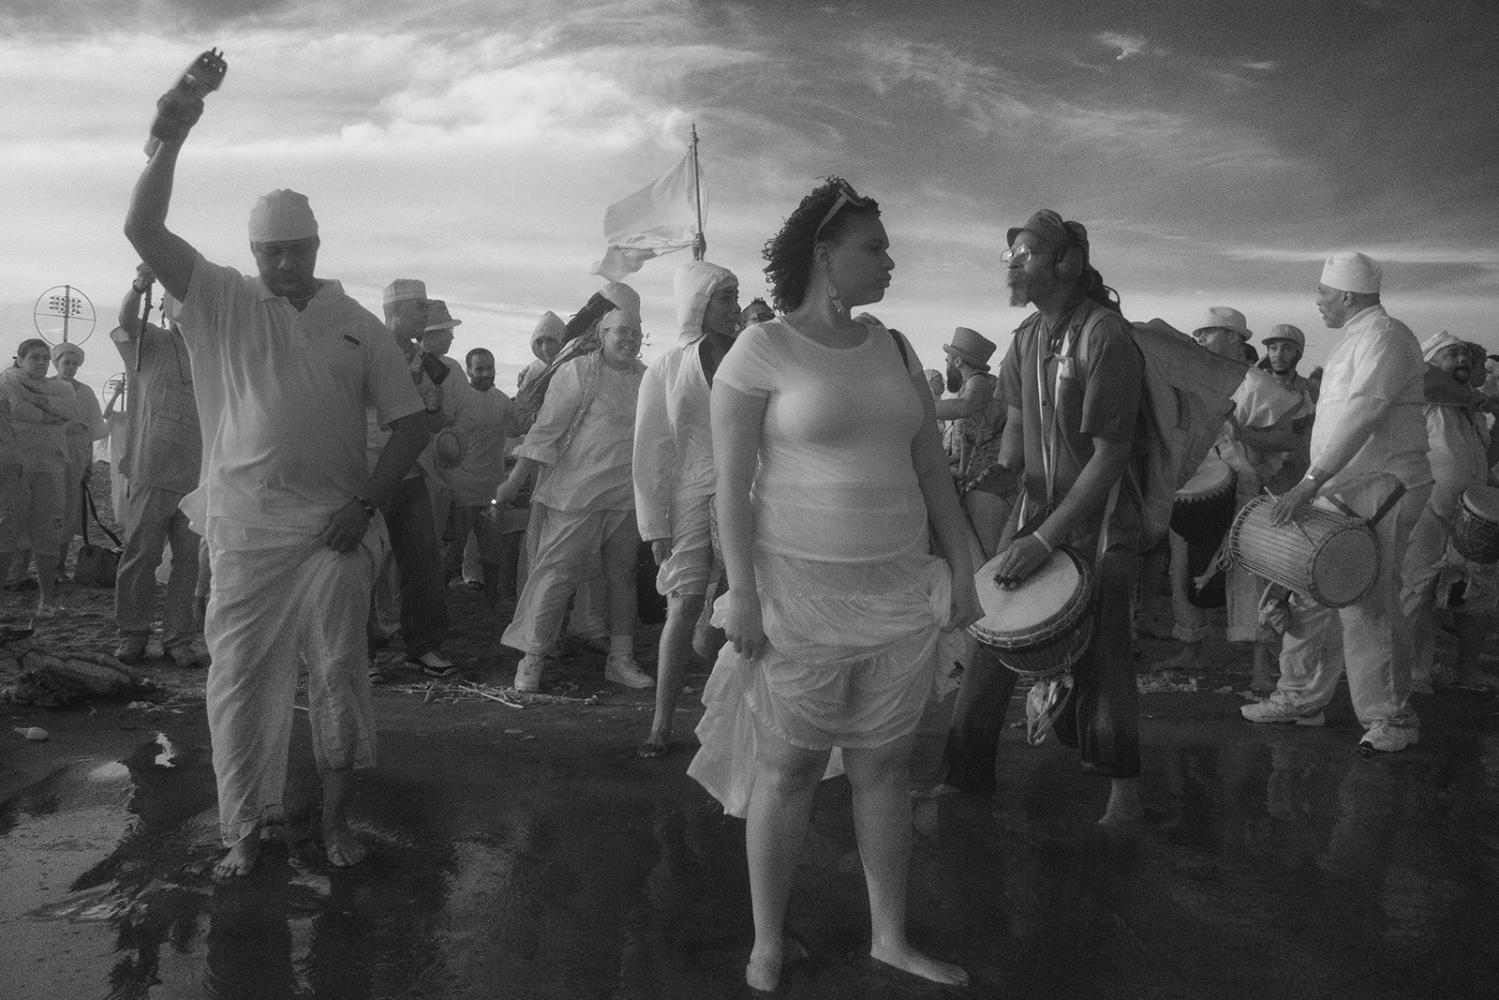 Art and Documentary Photography - Loading 08-michael-websterDSIR1580.jpg